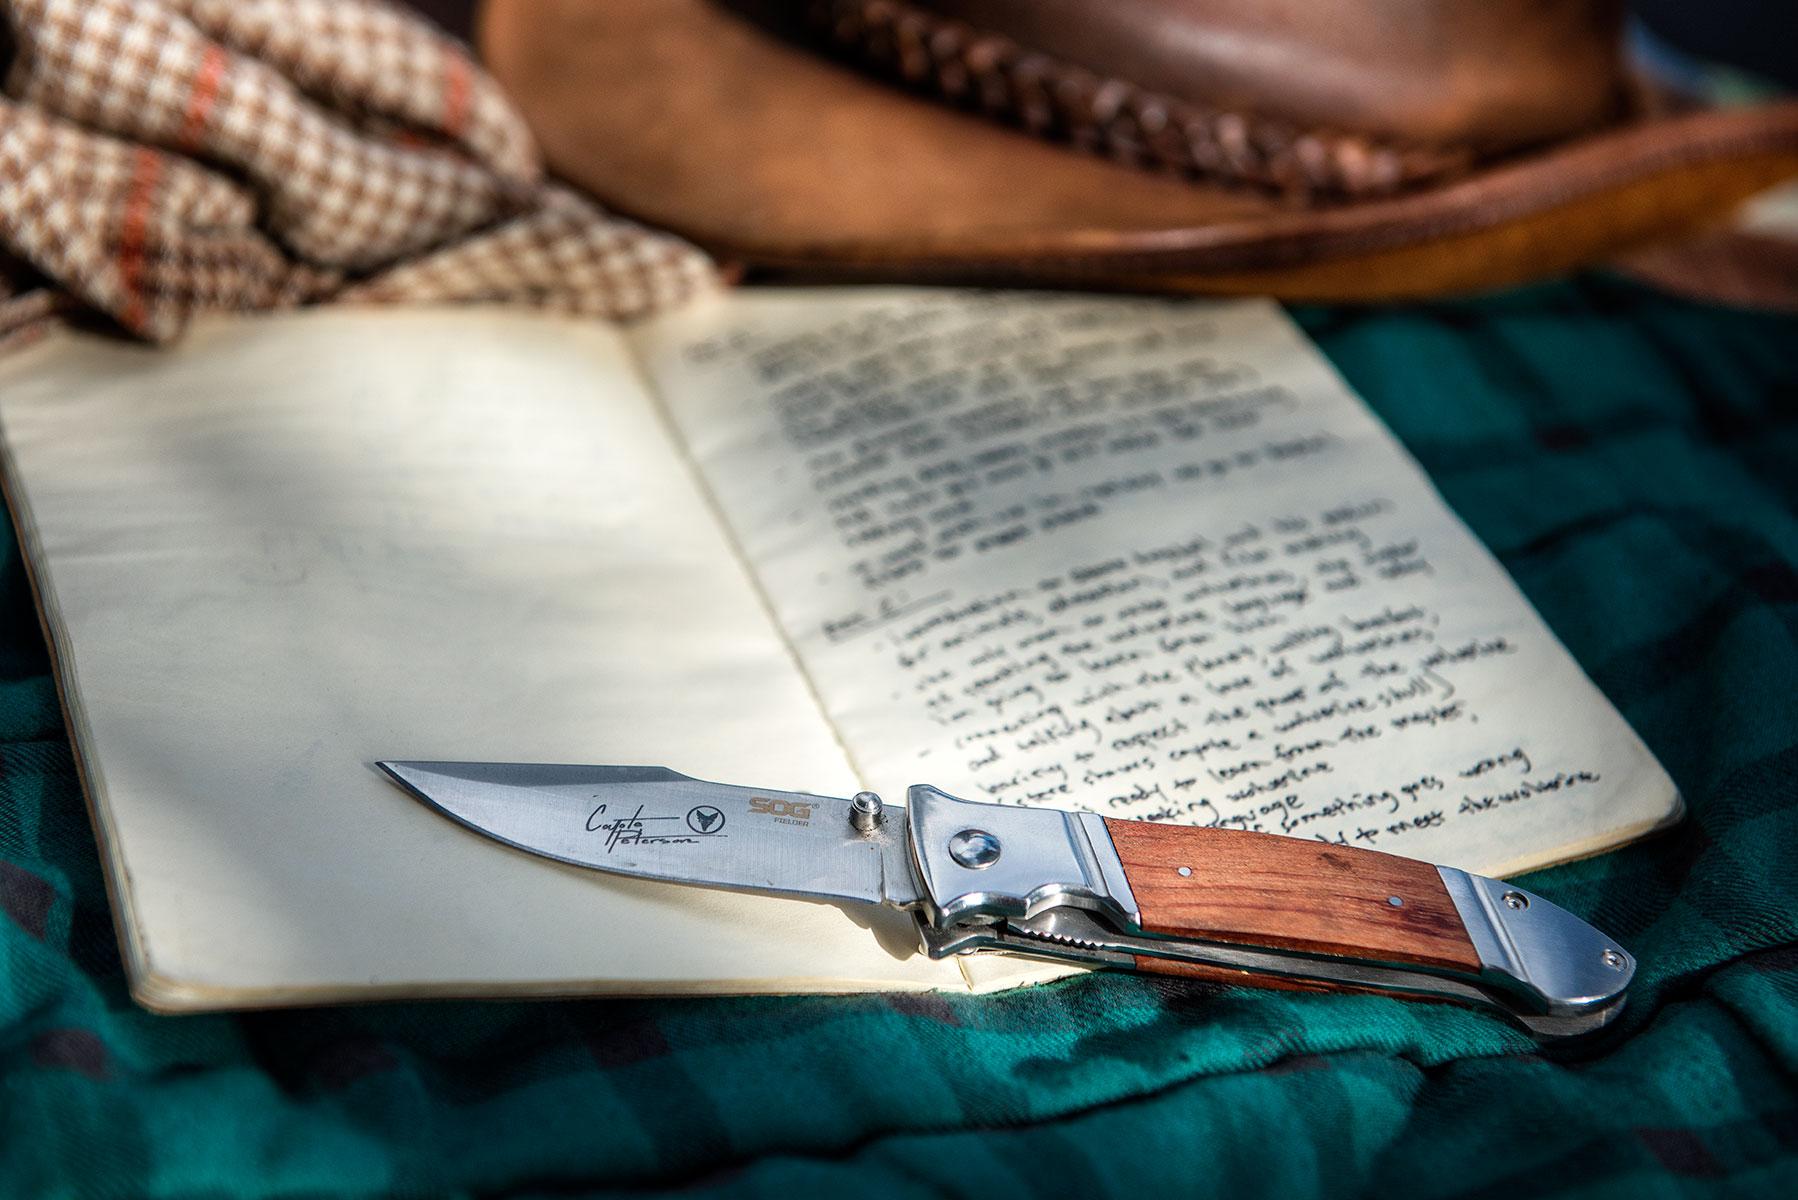 austin-trigg-brave-wilderness-alaska-Sog-Diary-product.jpg